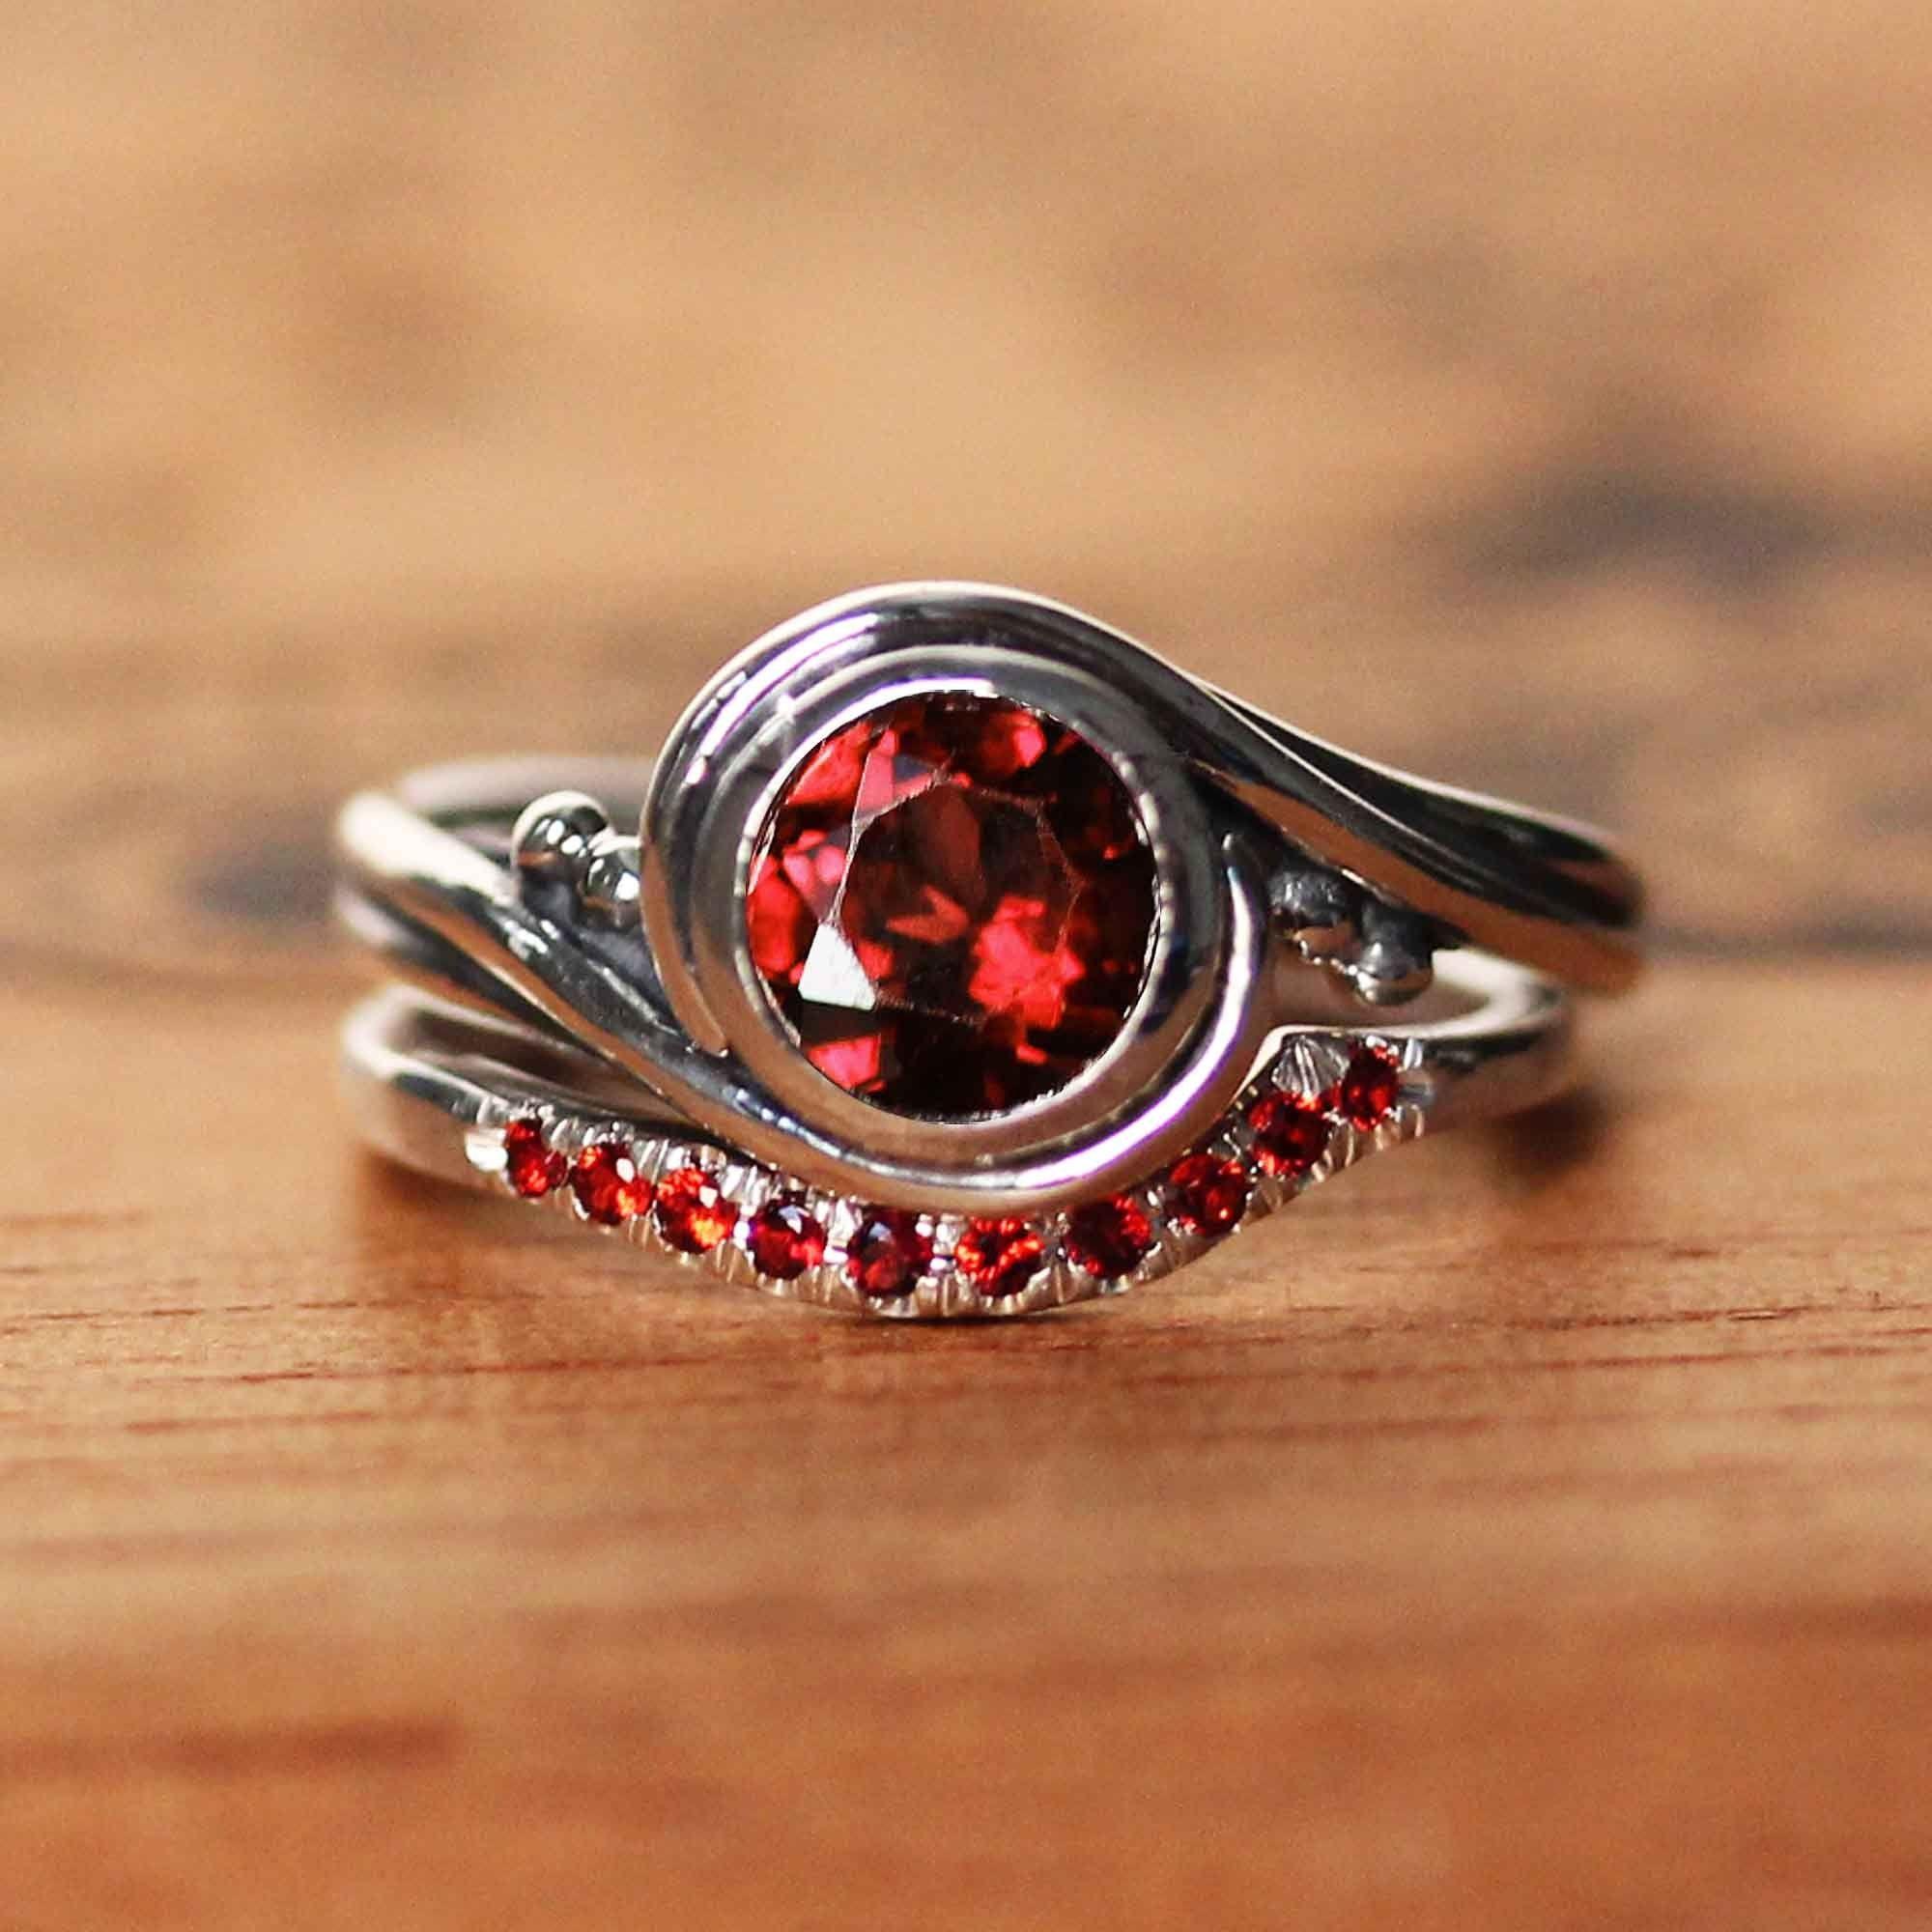 Garnet Engagement Ring Set Anniversary Ring Red Garnet Etsy In 2020 Garnet Engagement Ring Wedding Ring Sets Unique Engagement Ring Settings